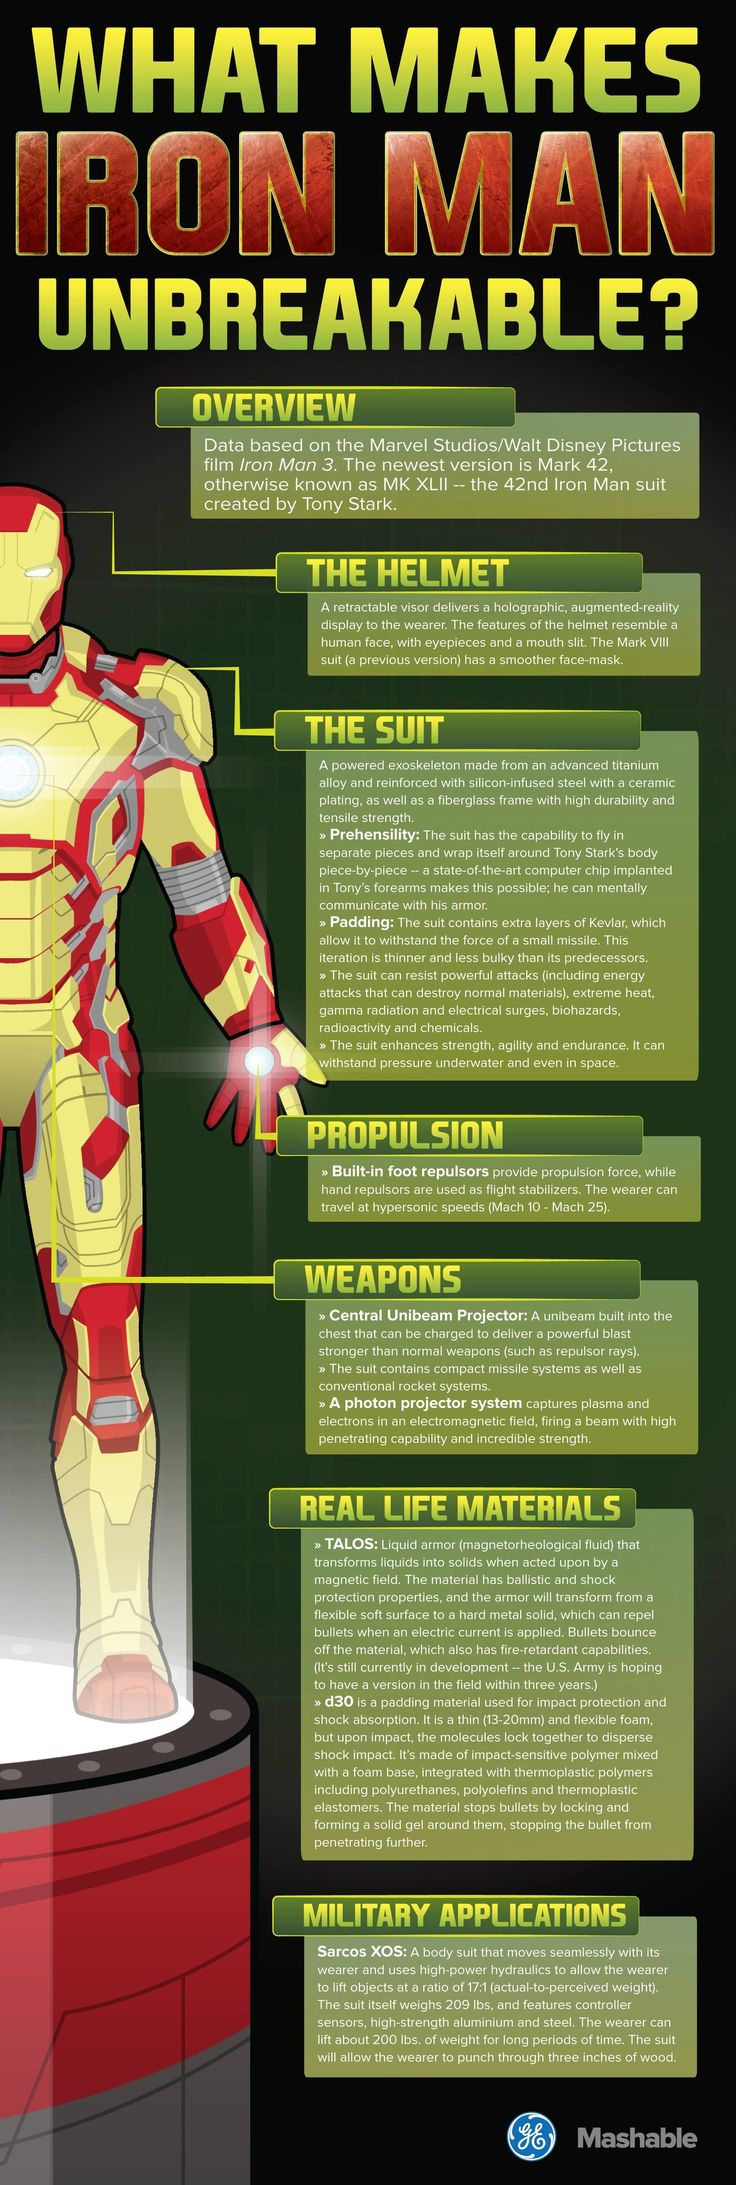 How Indestructible Is Iron Man's Suit?